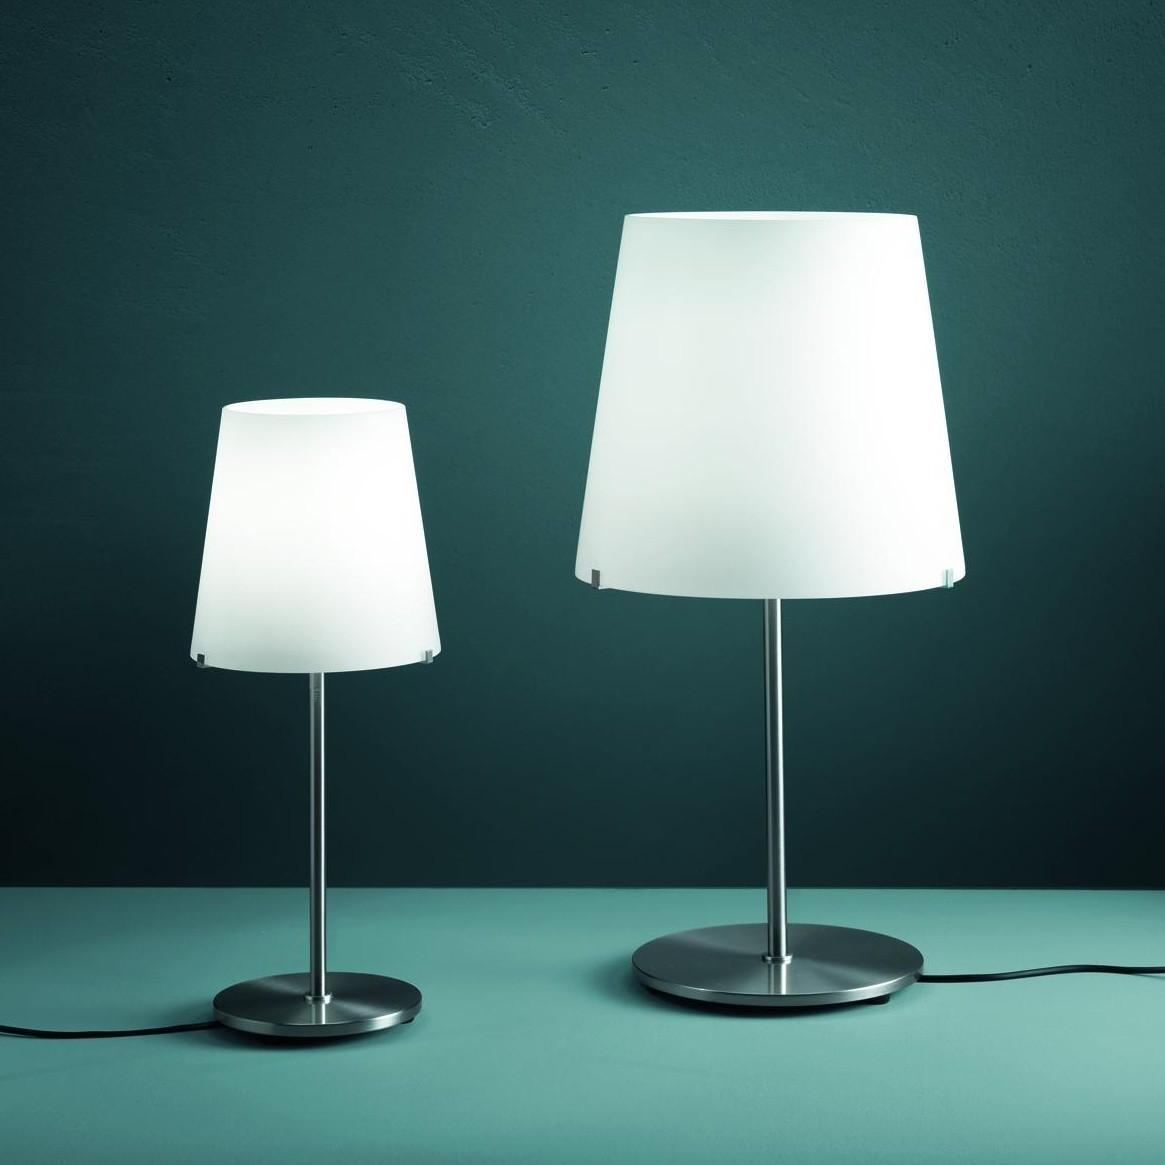 fontana arte 3247ta table lamp ambientedirect rh ambientedirect com